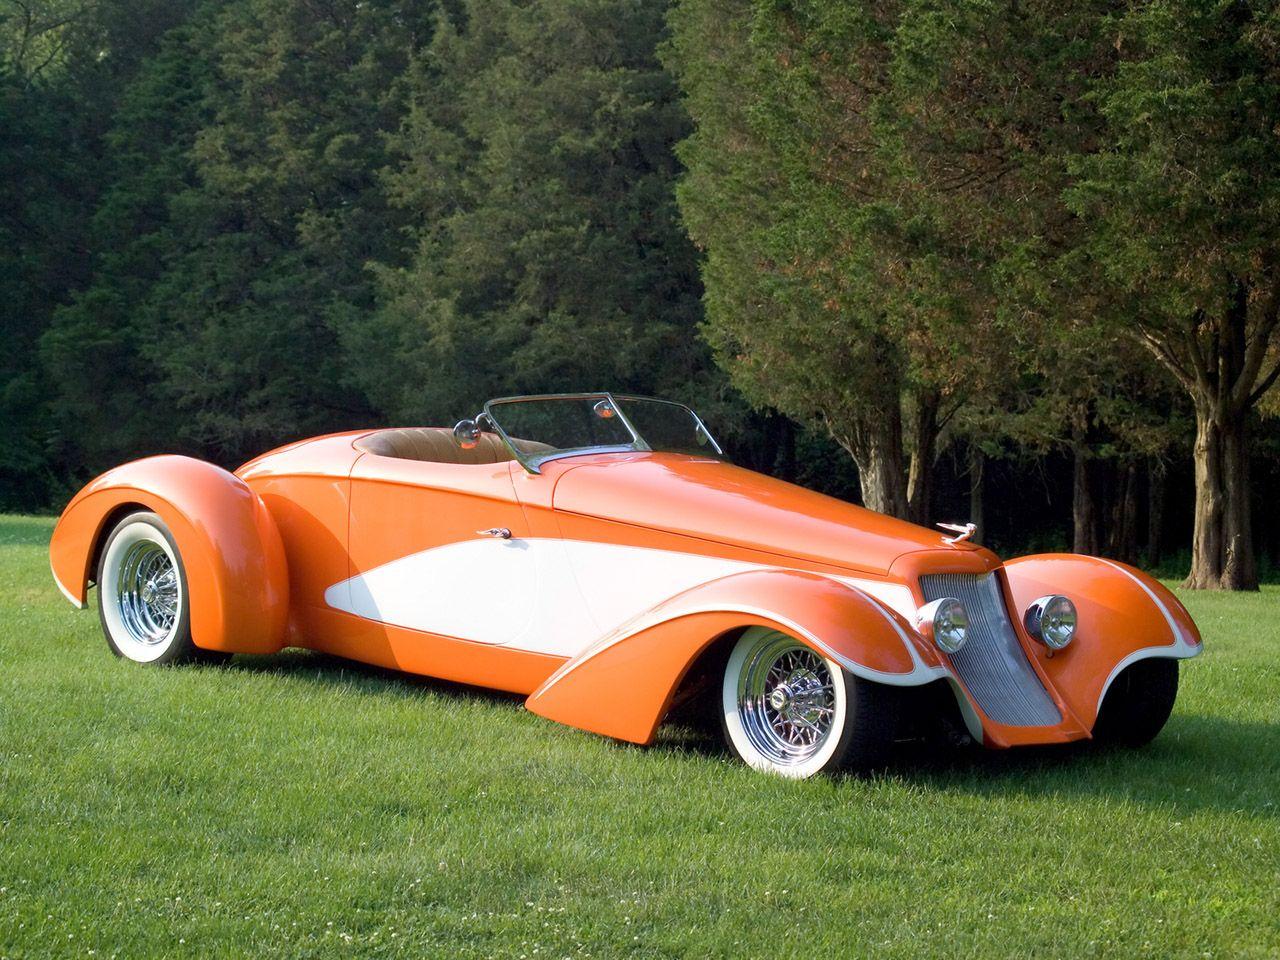 chip foose custom cars wallpapers - photo #7